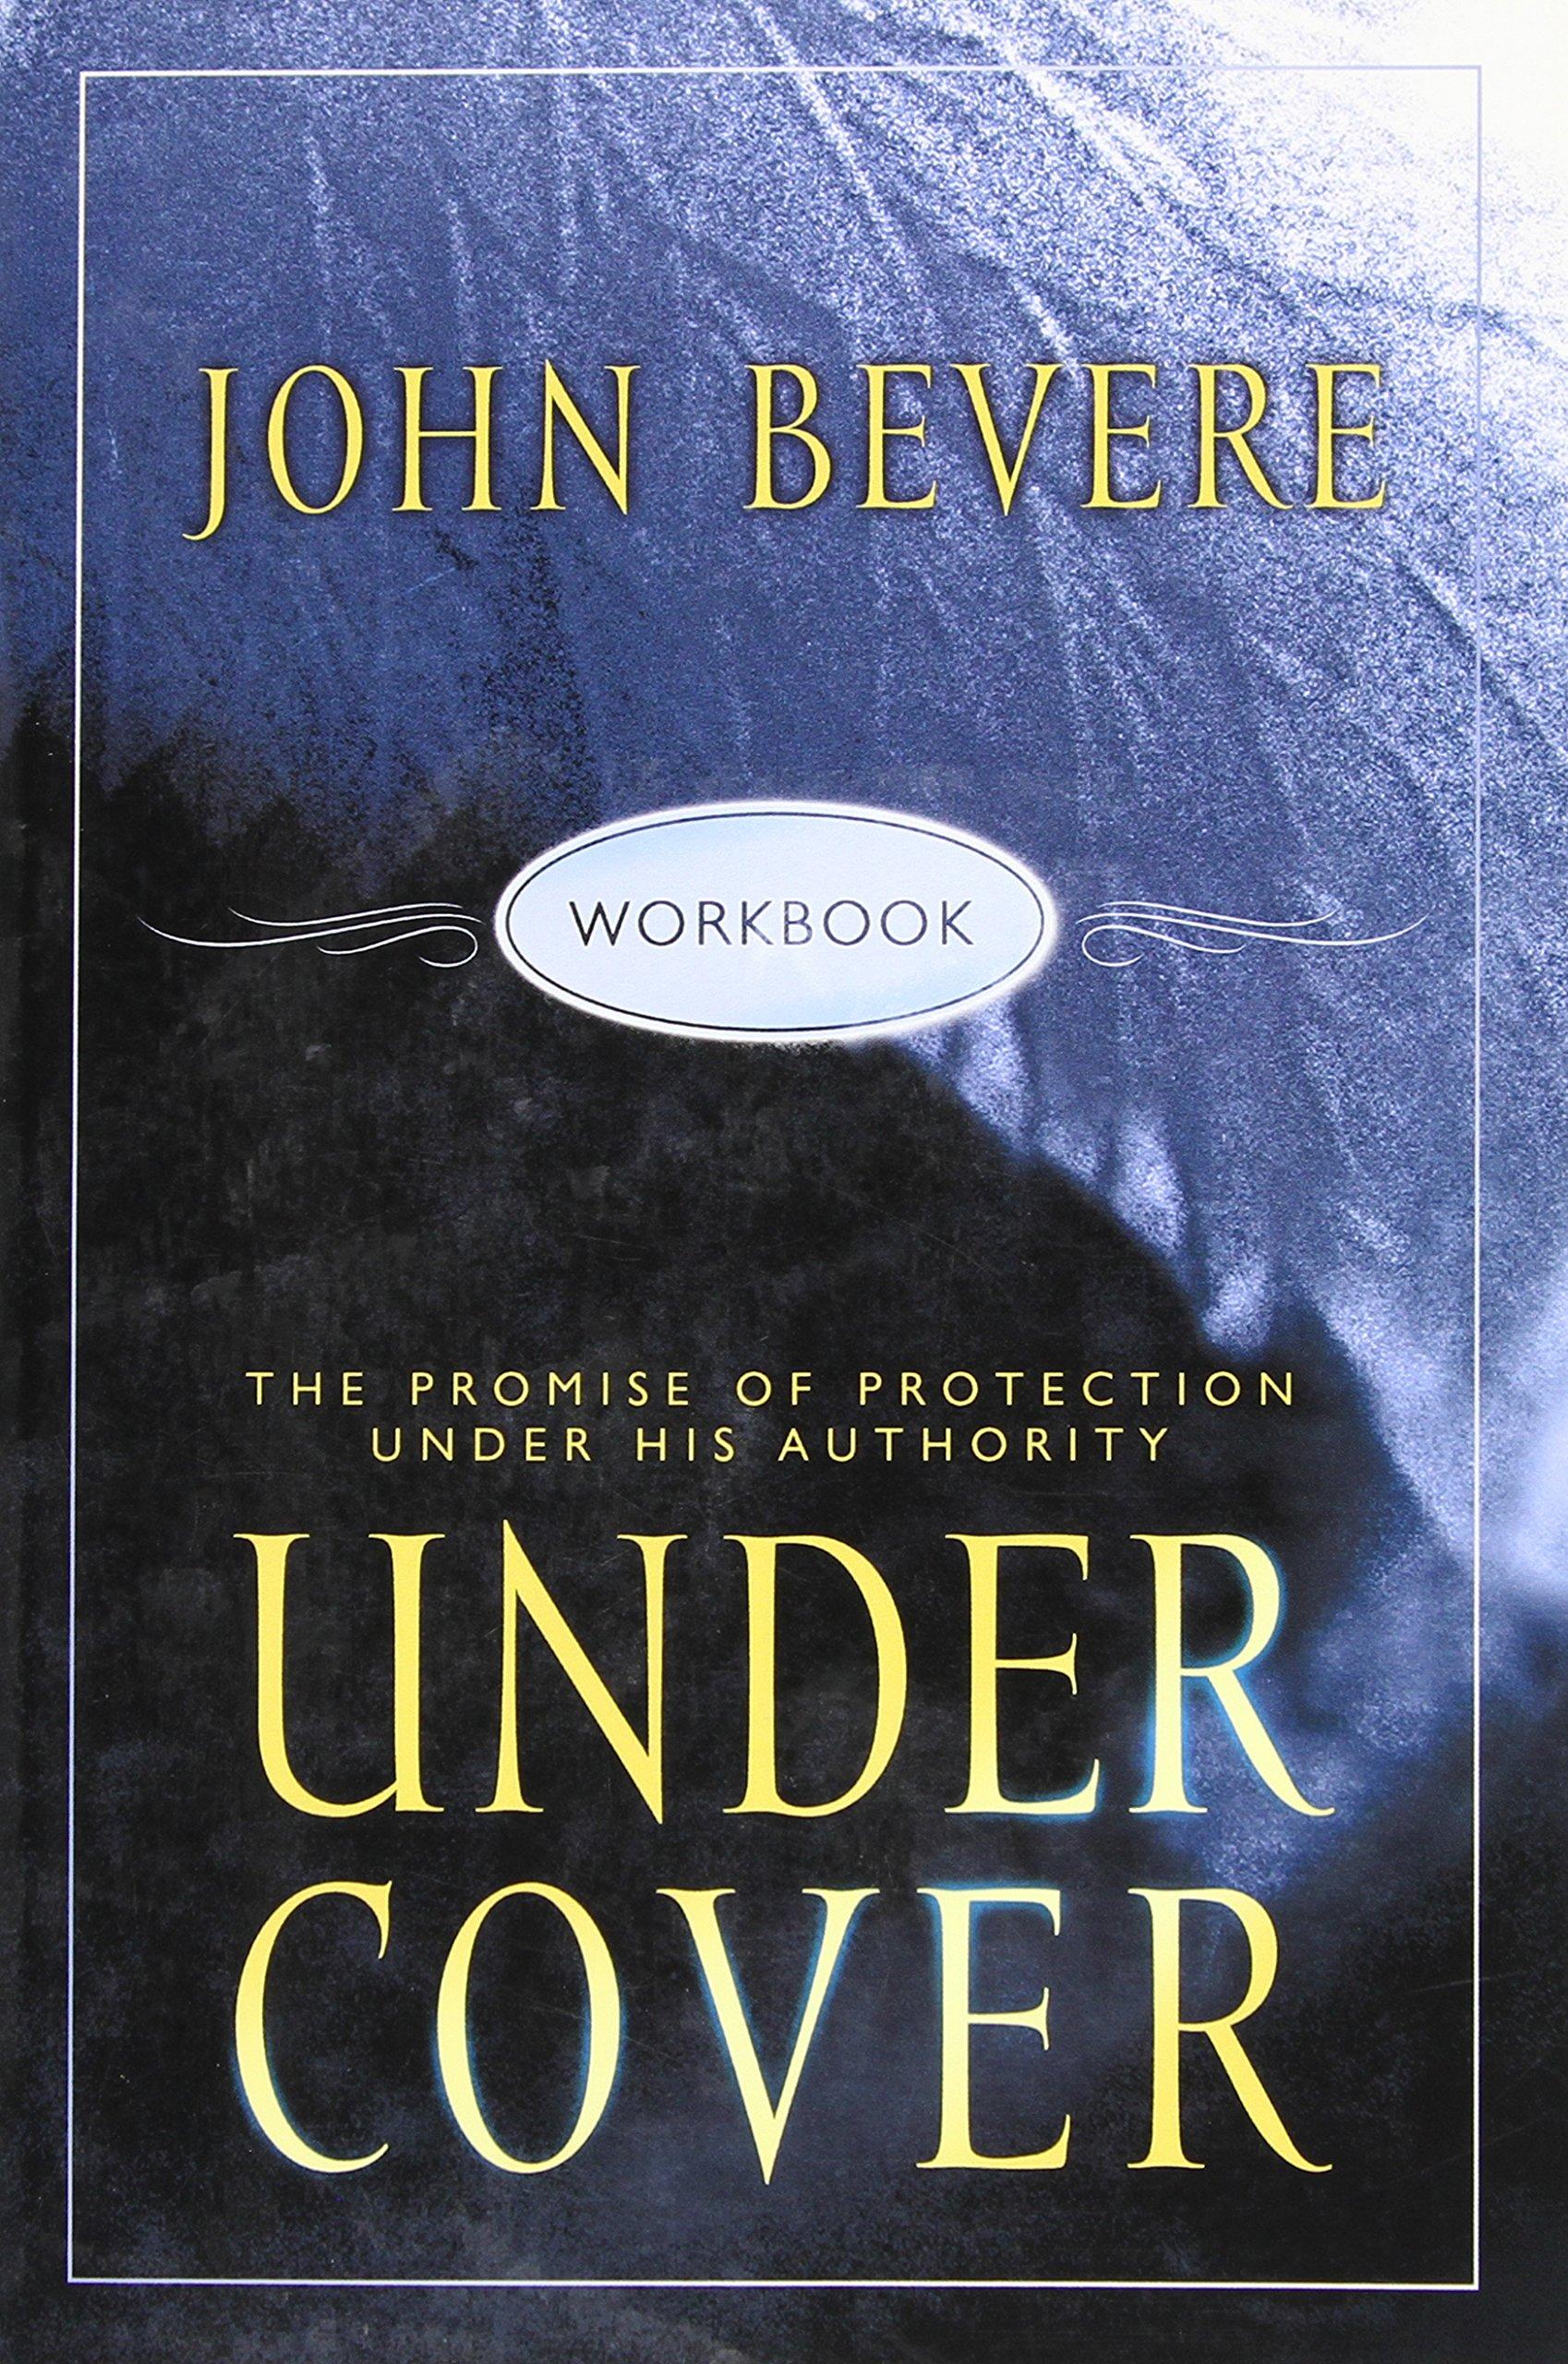 Under cover workbook 9781933185101 amazon books fandeluxe Gallery